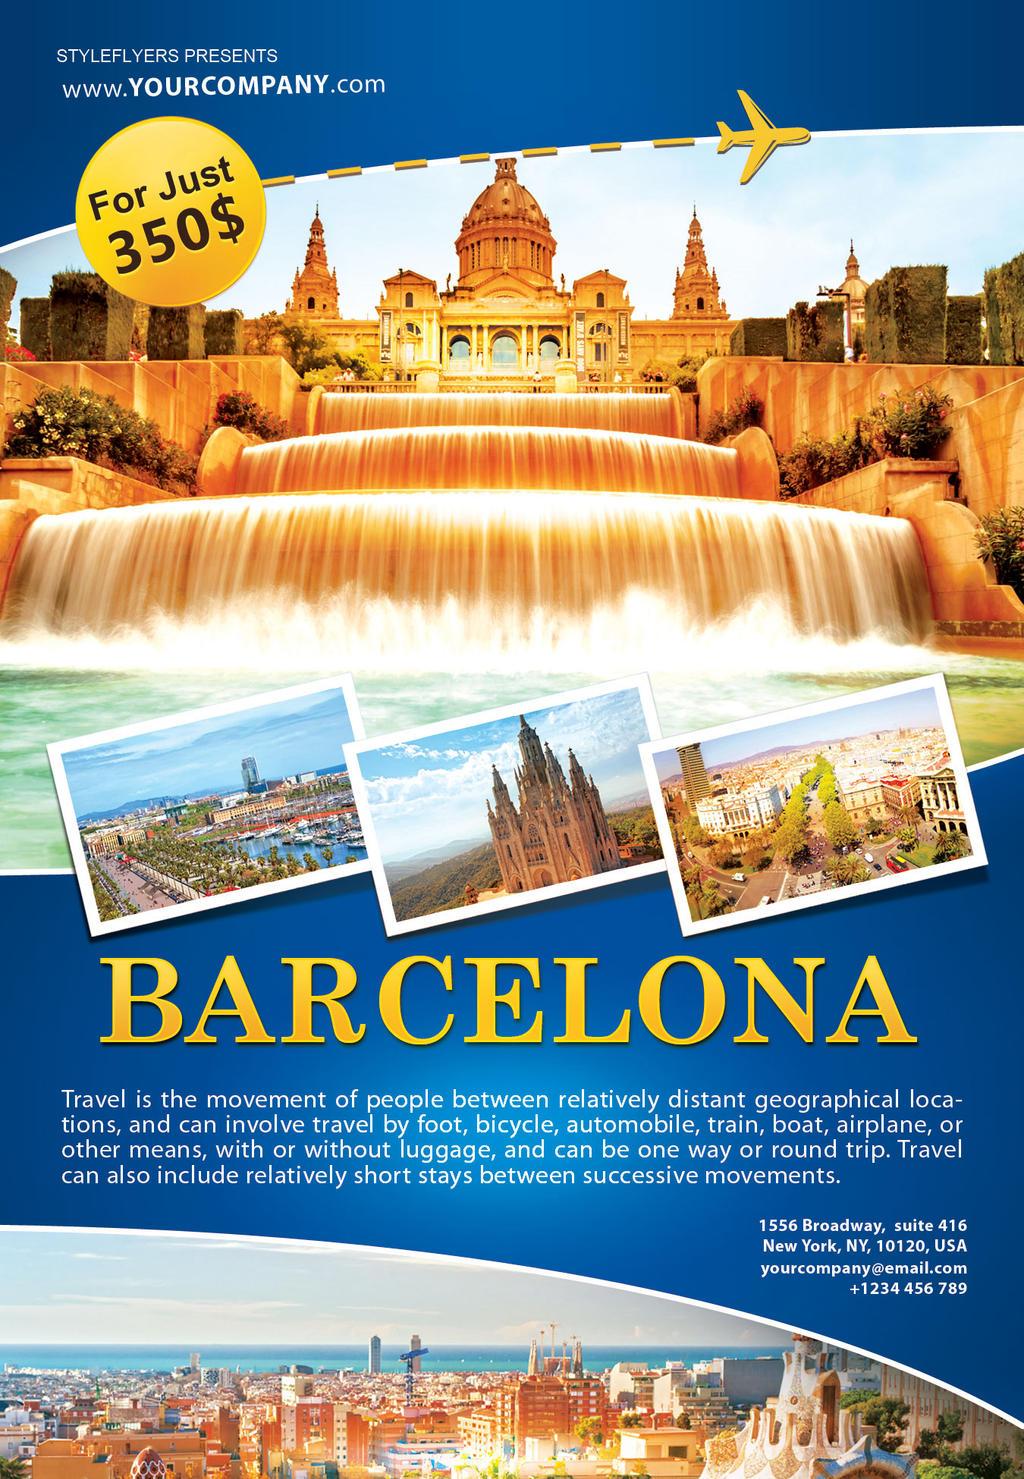 Barcelona Travel Flyer By Styleflyers